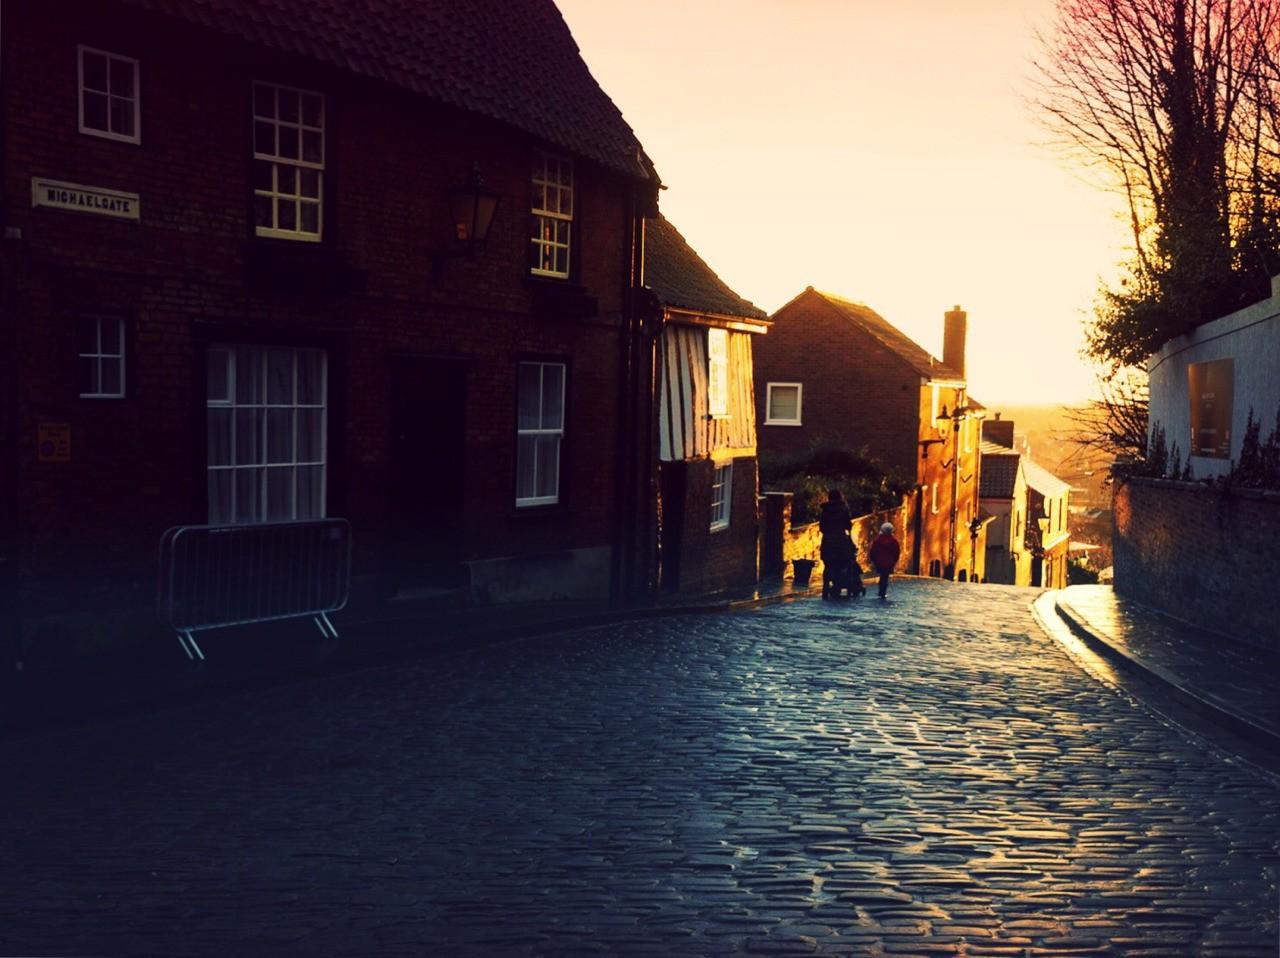 Towards the light... Lincoln, UK - follow me on Instagram: @fotofacade